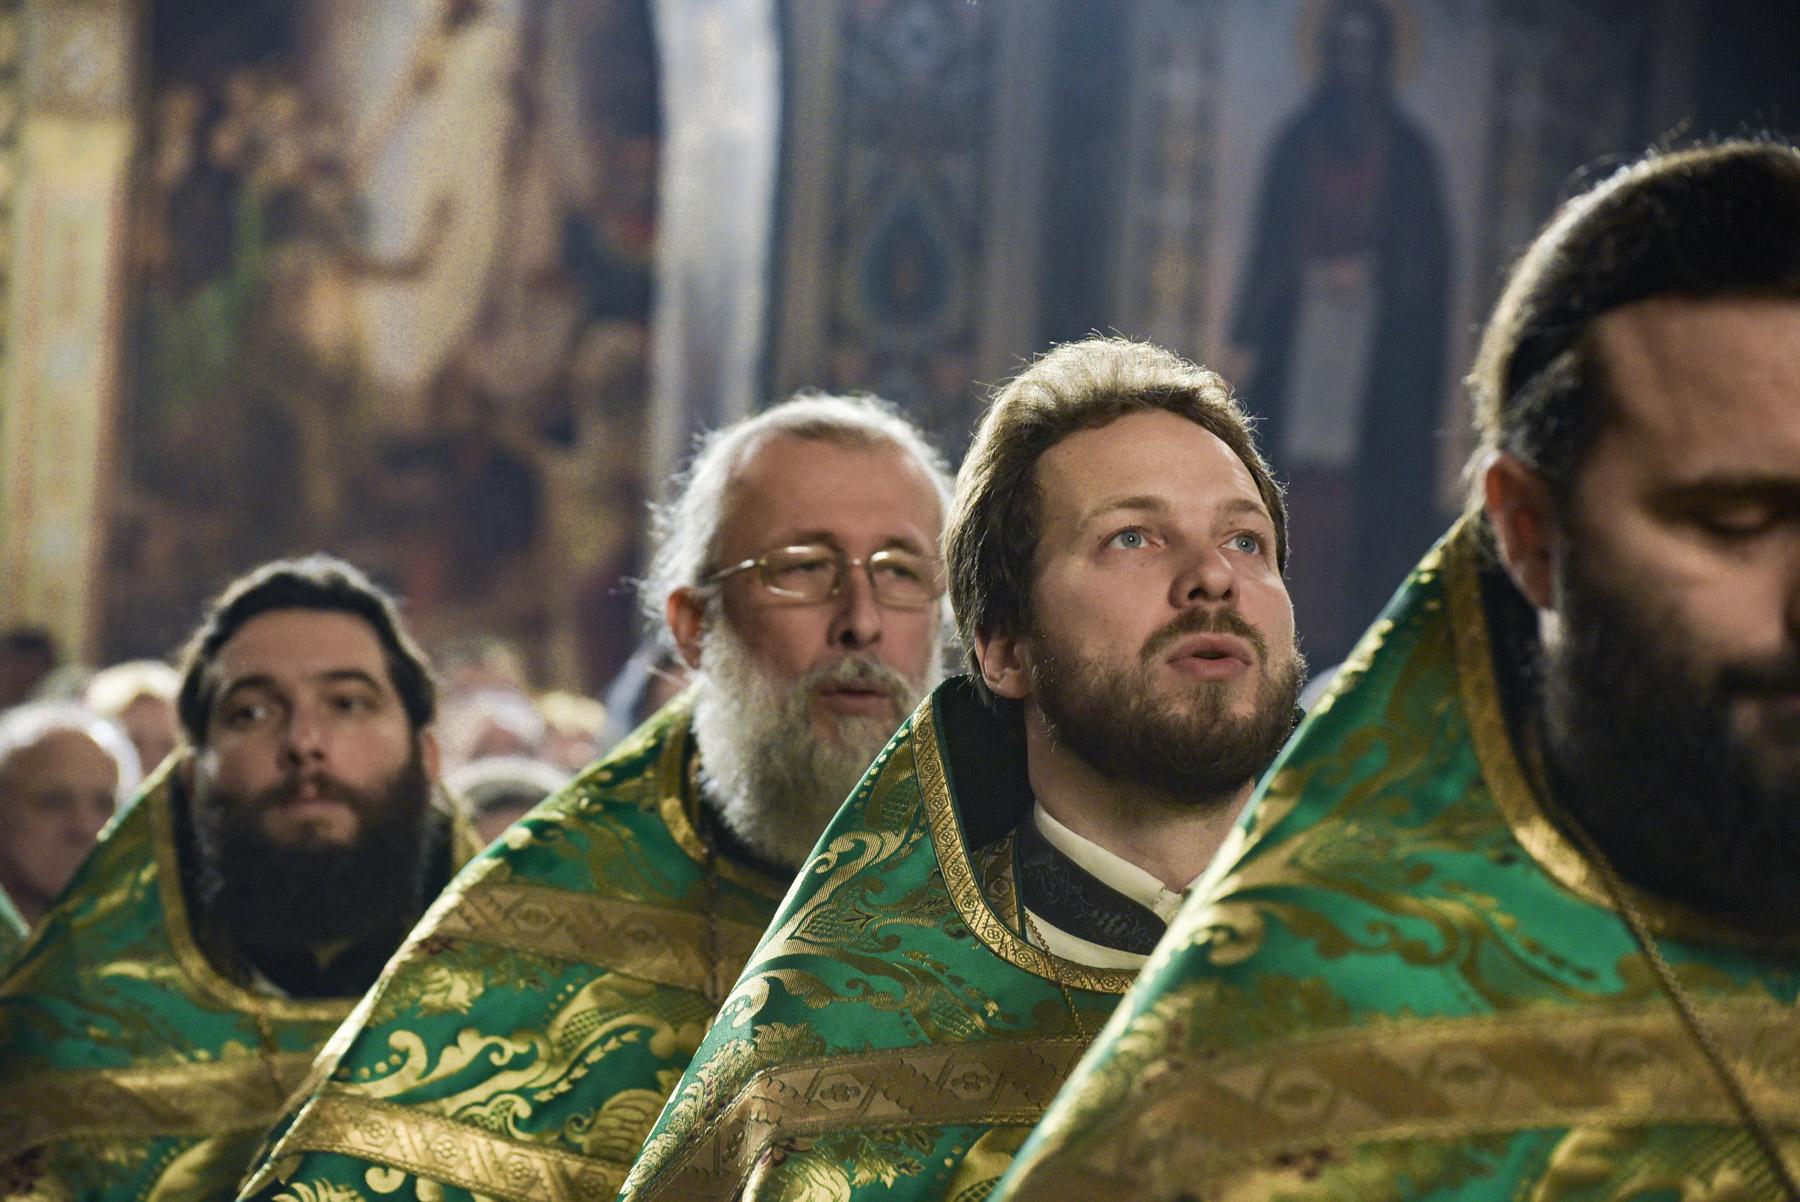 photos of orthodox christmas 0091 2